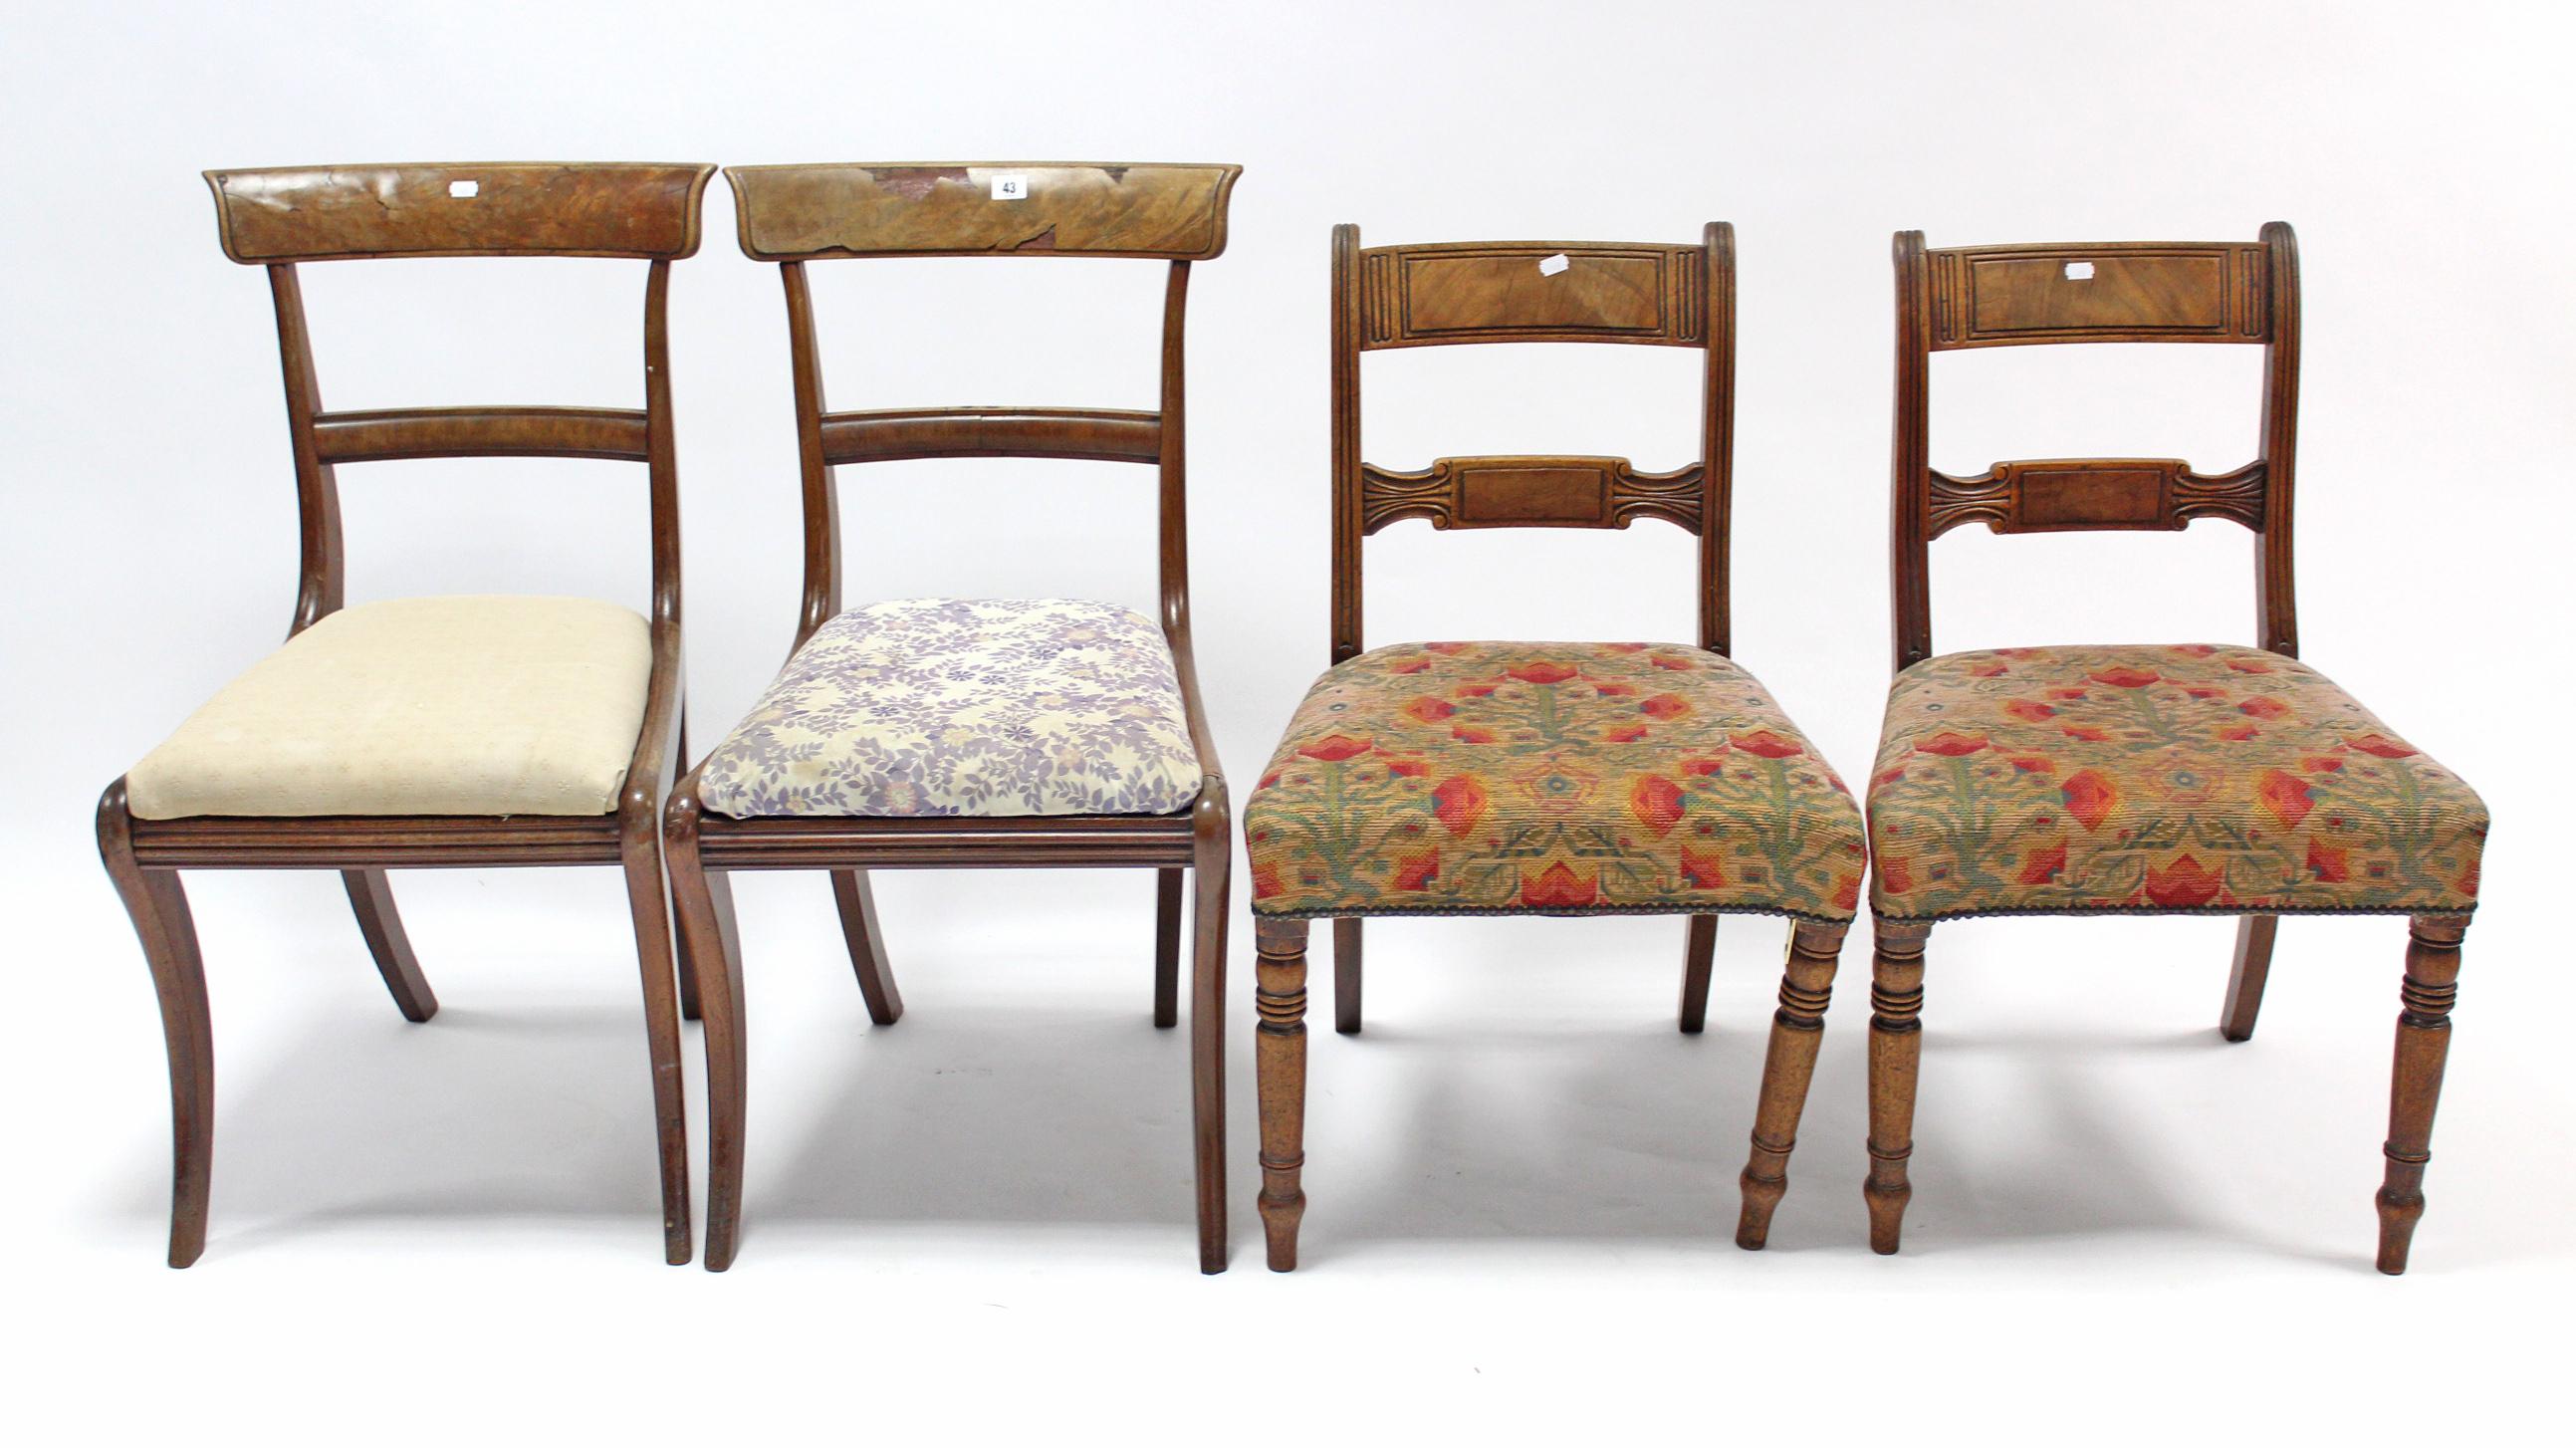 Lot 43 - Two pairs of 19th century mahogany bow-back dining chairs; & a similar bow-back dining chair, part